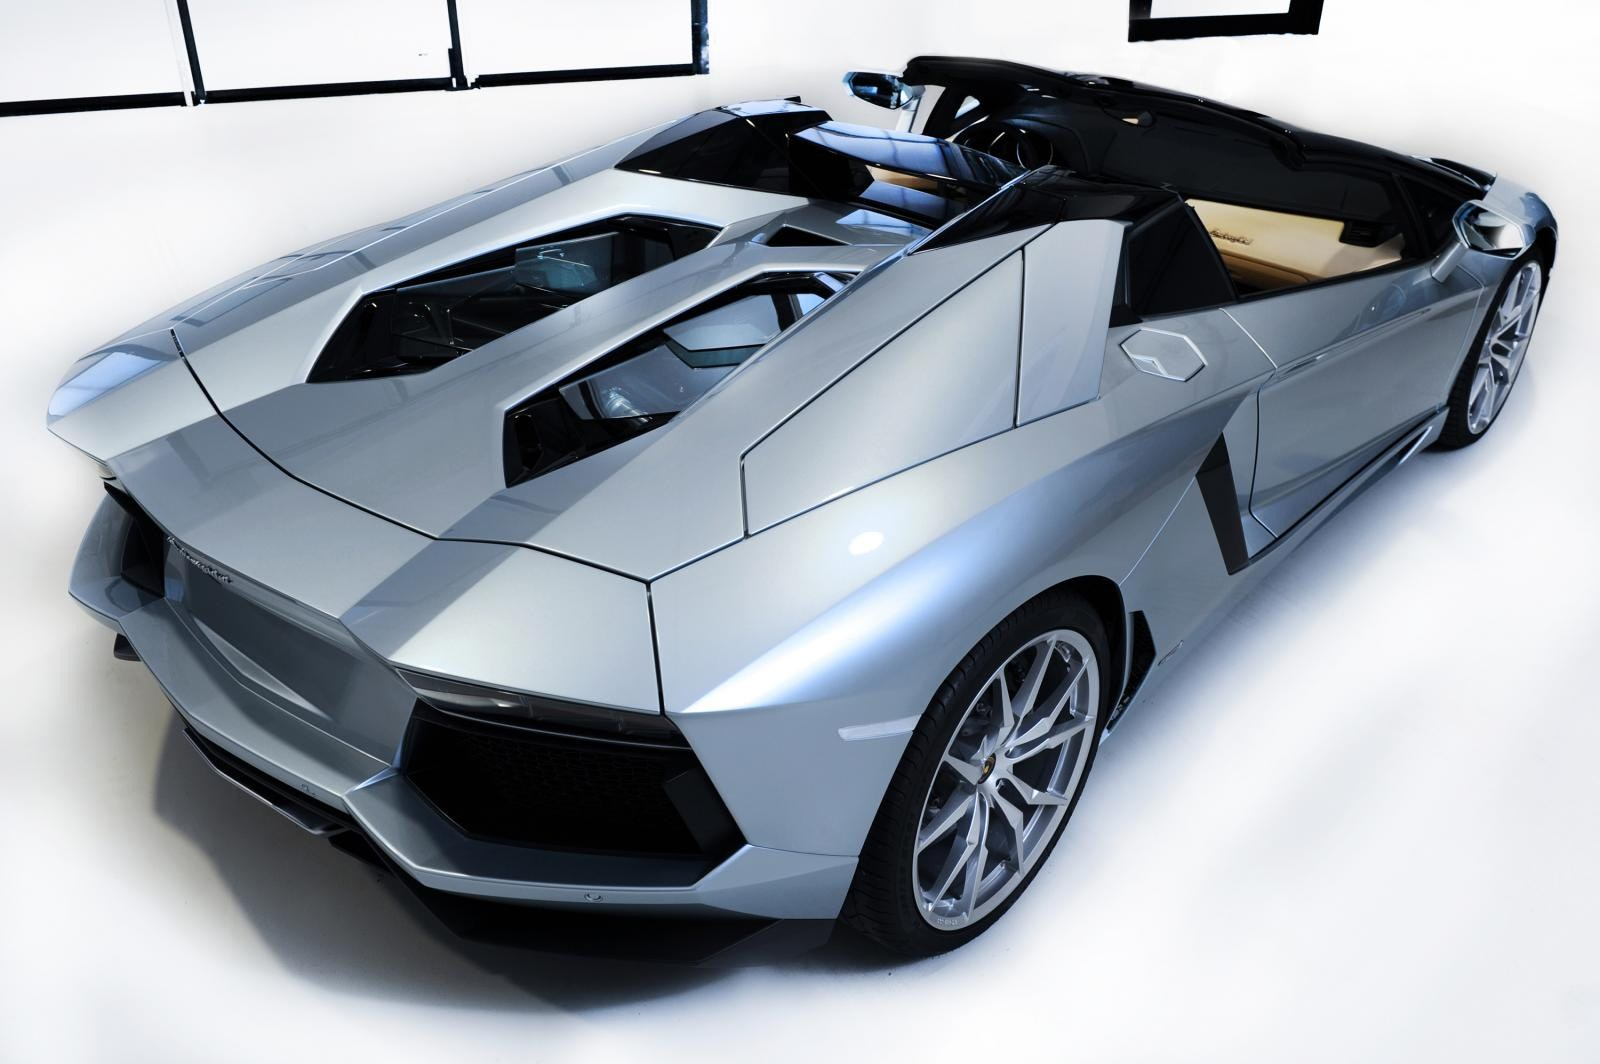 Lamborghini Aventador Lp700 4 Roadster Prices Review